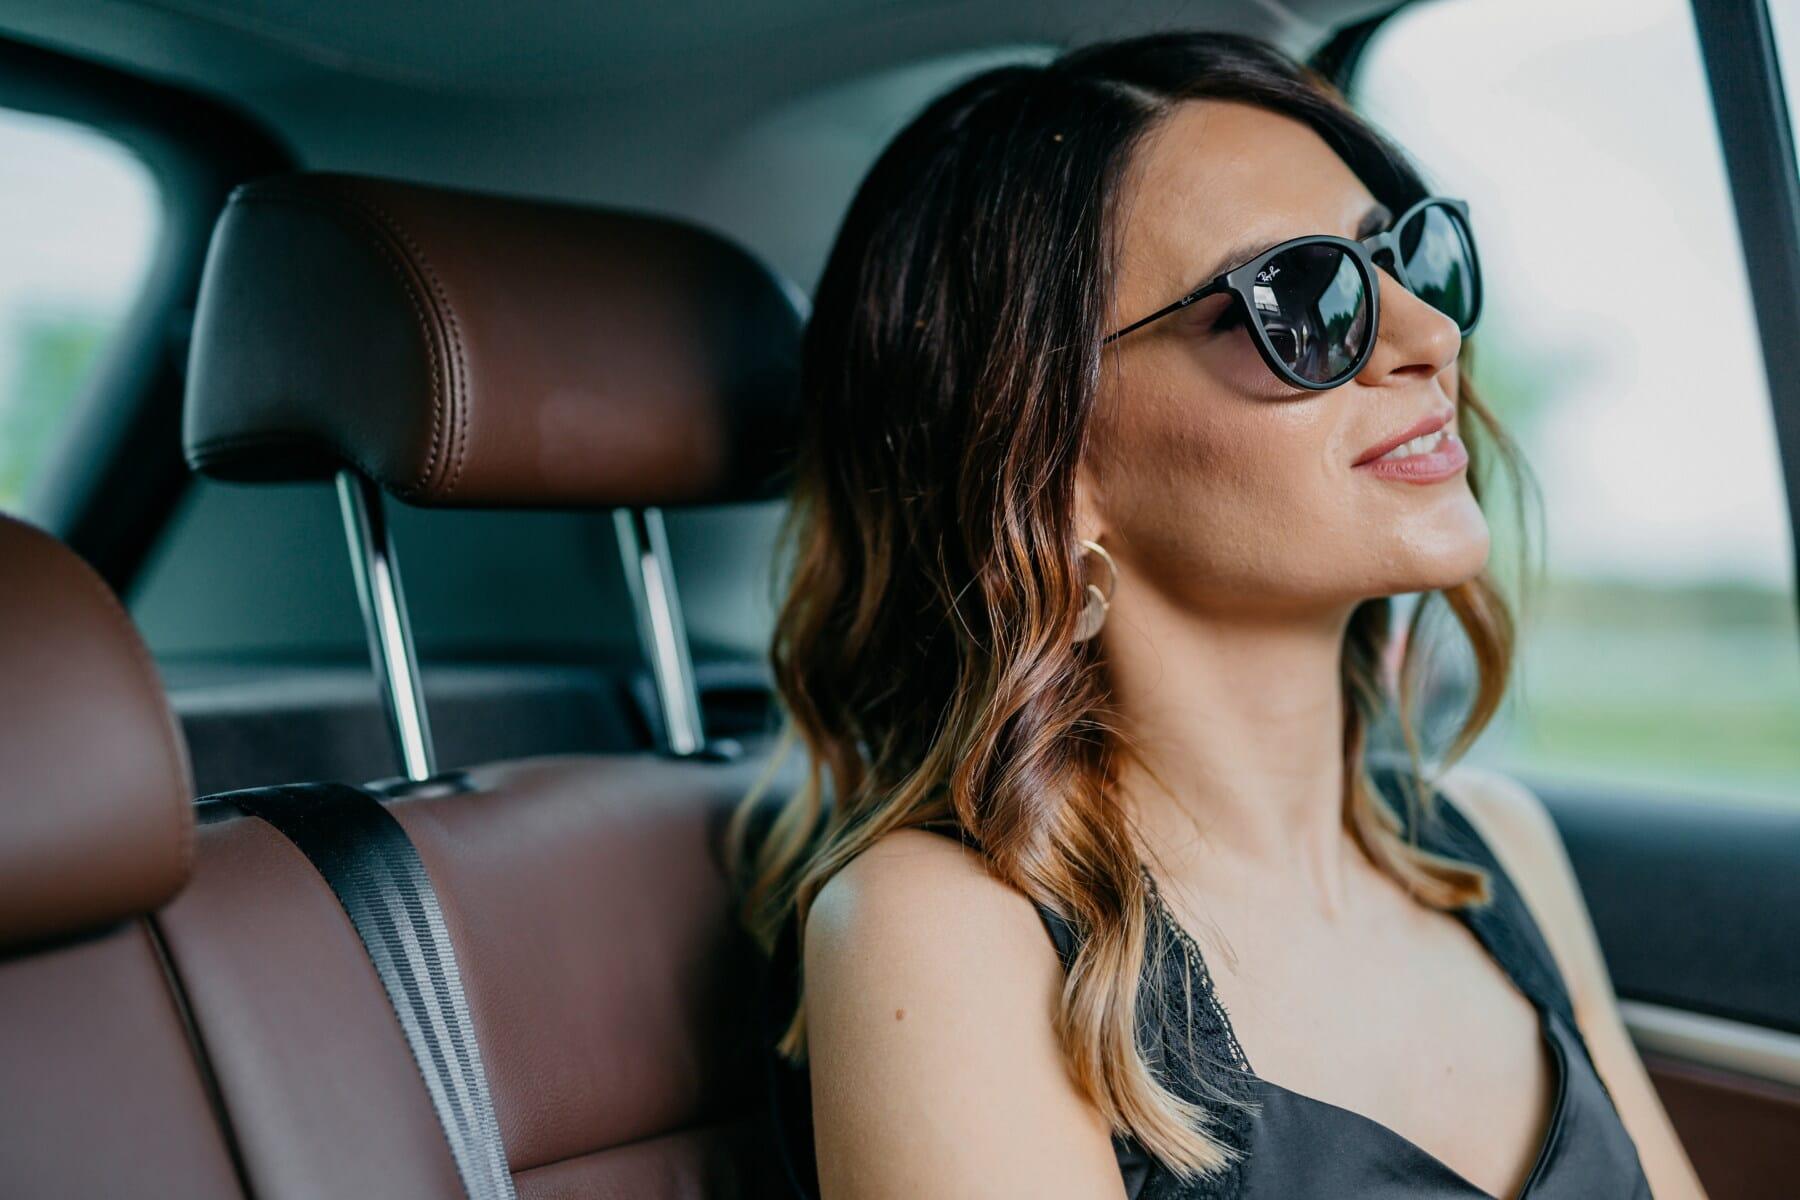 smiling, pretty girl, driving, car seat, passenger, car, sedan, fashion, seat belt, woman